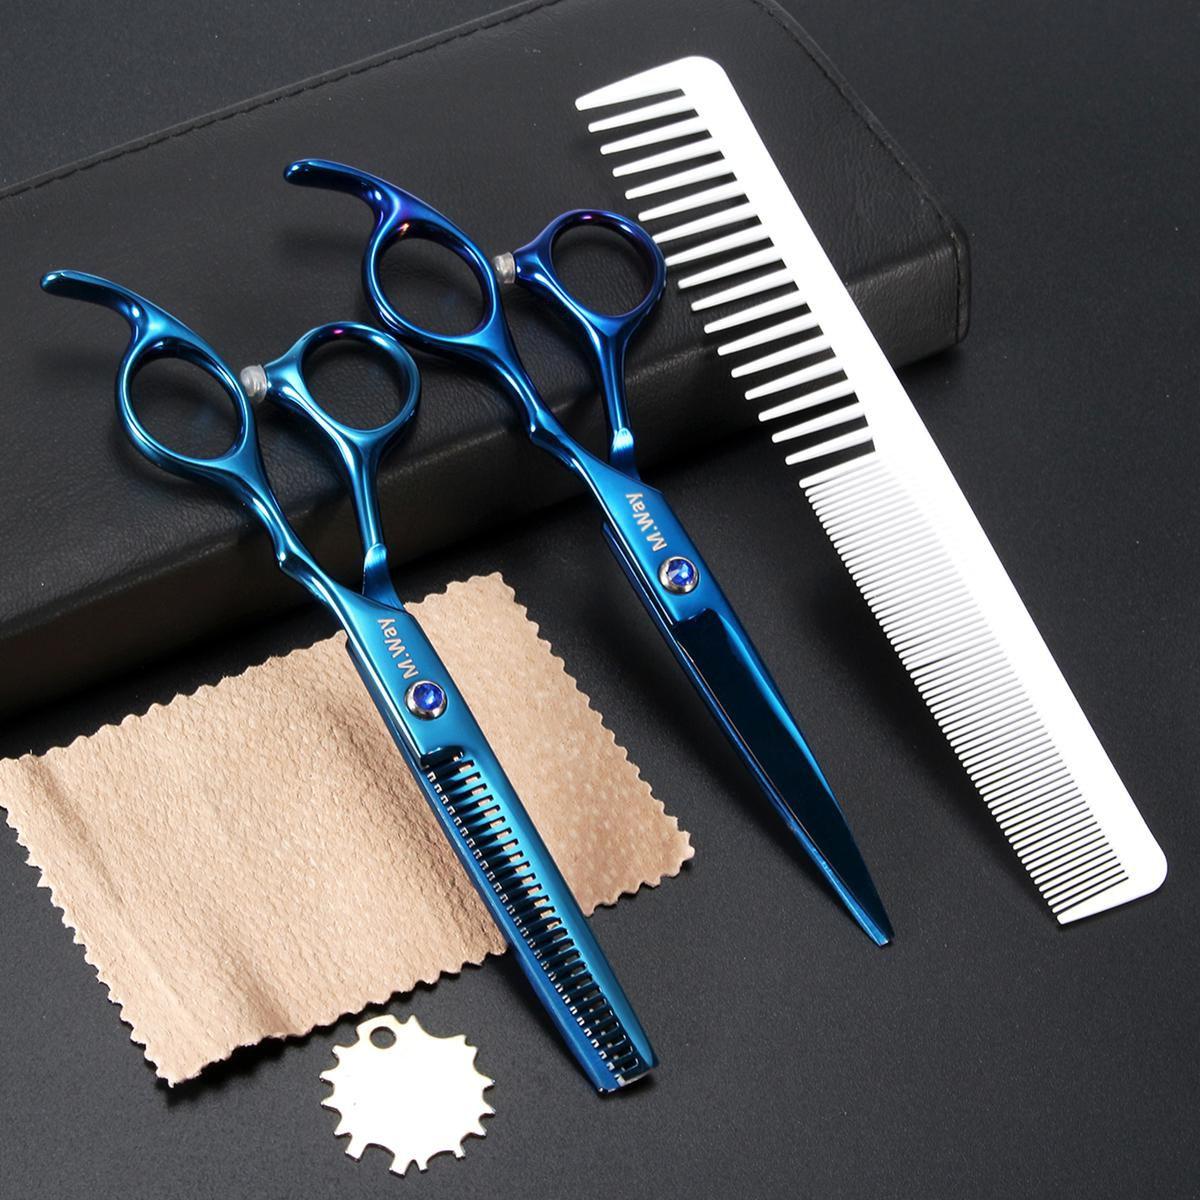 6\u0027\u0027 Pro Pet Dog Cat Grooming Hair Cutting Thinning Scissor Shear Comb Set  Bag